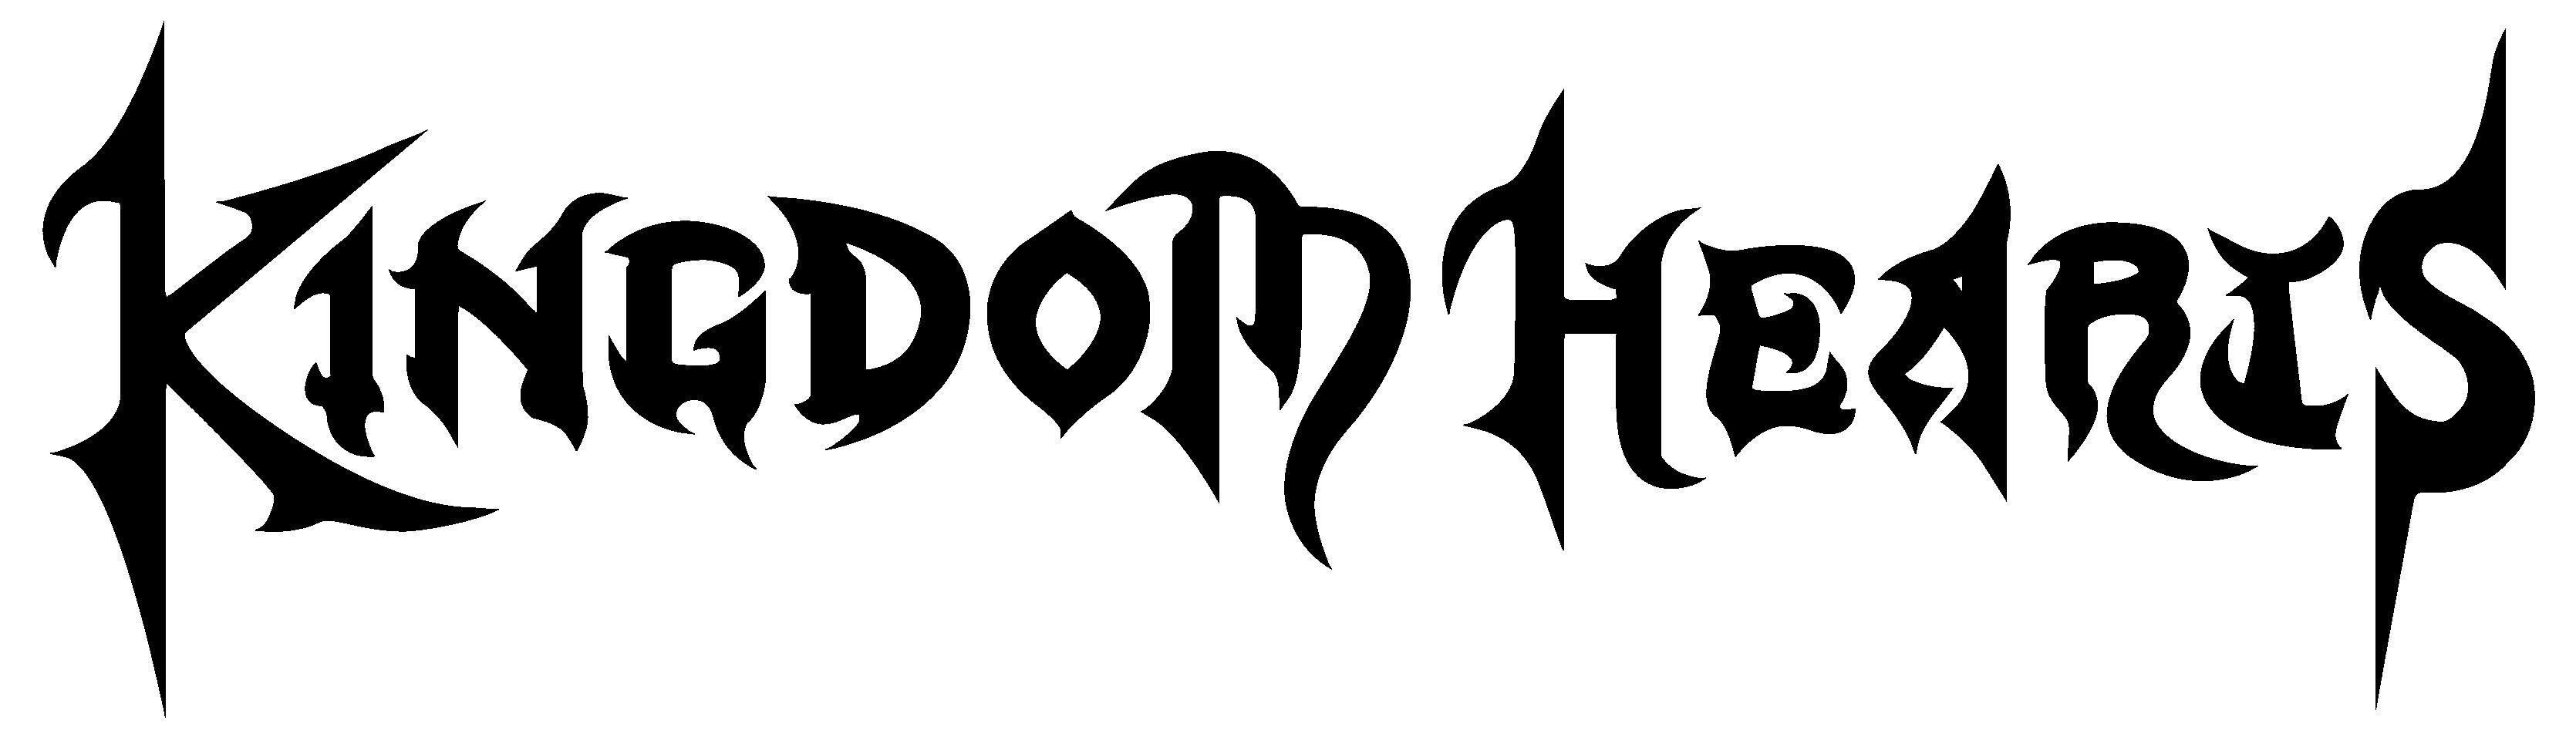 File wordmark the fourth. Kingdom hearts logo png